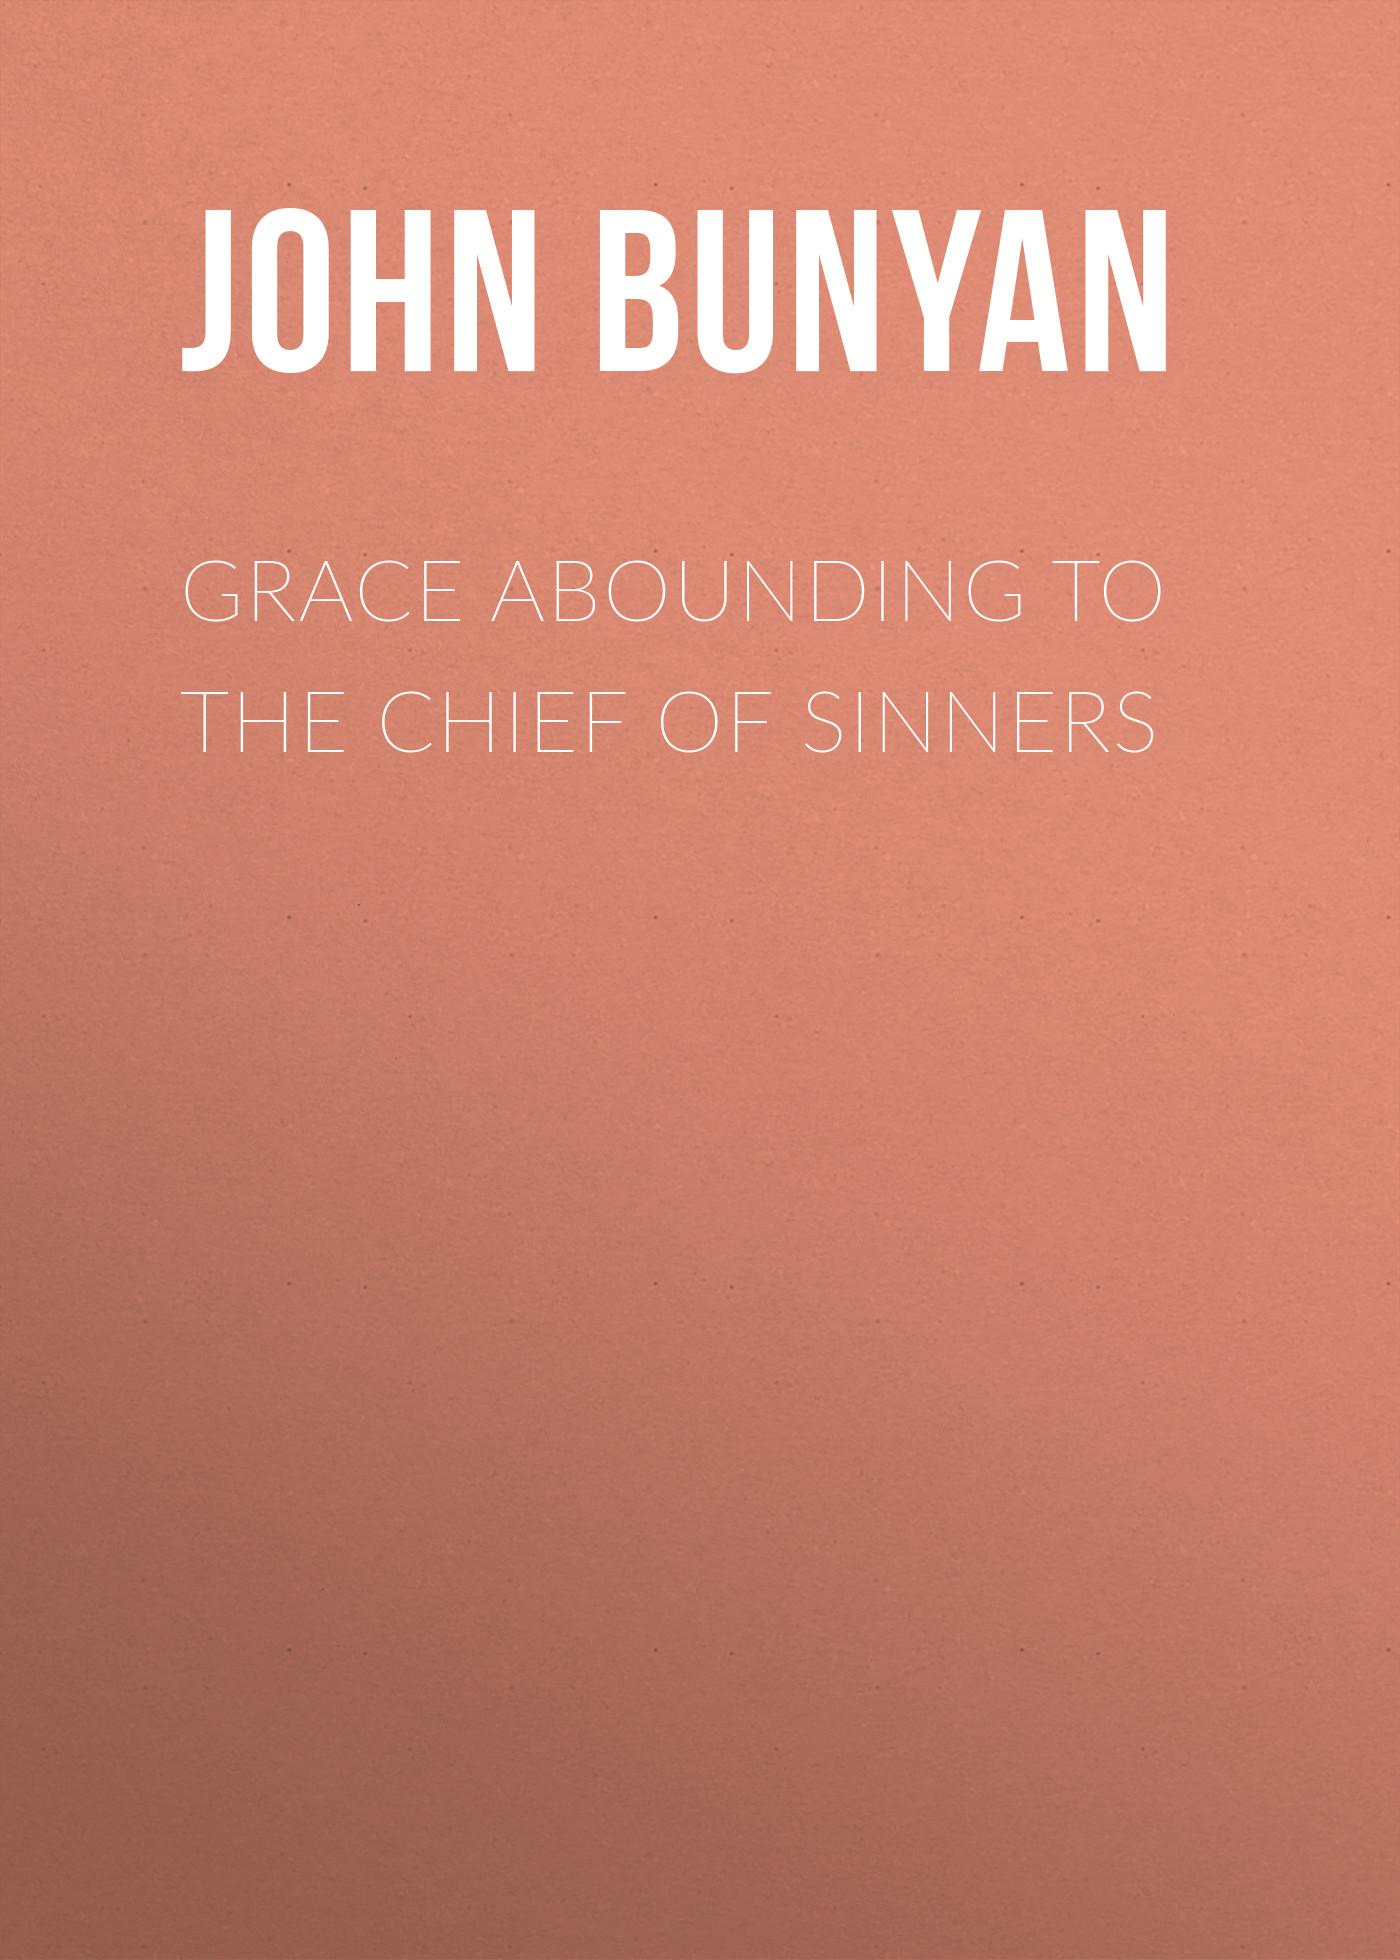 John Bunyan Grace Abounding to the Chief of Sinners